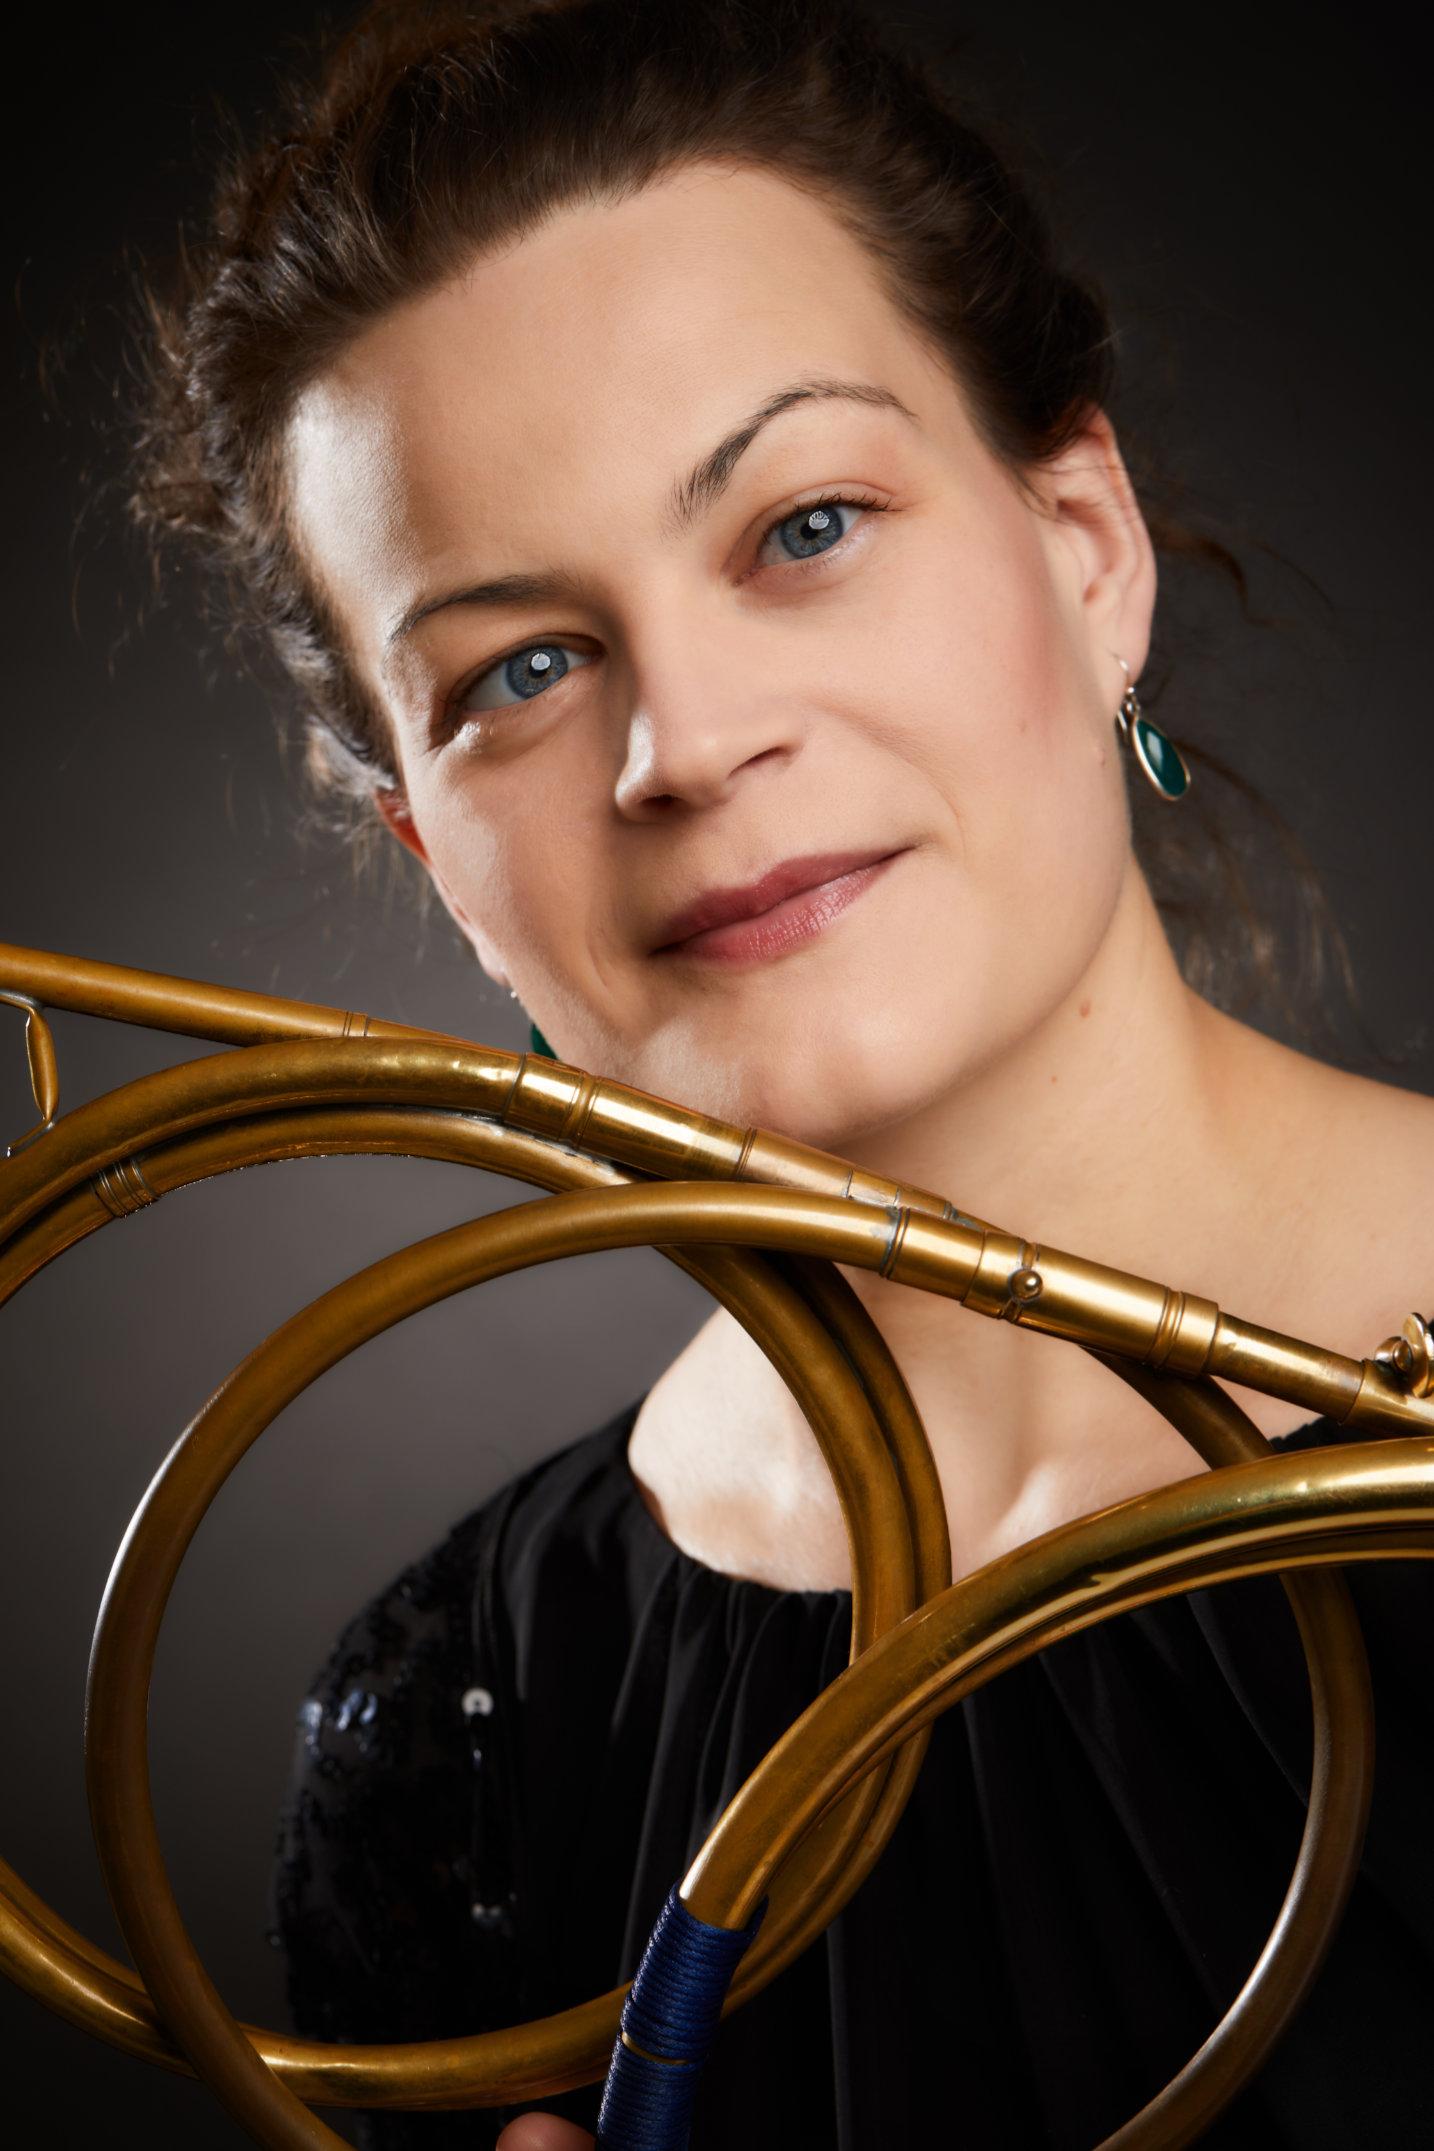 Ursula Monberg